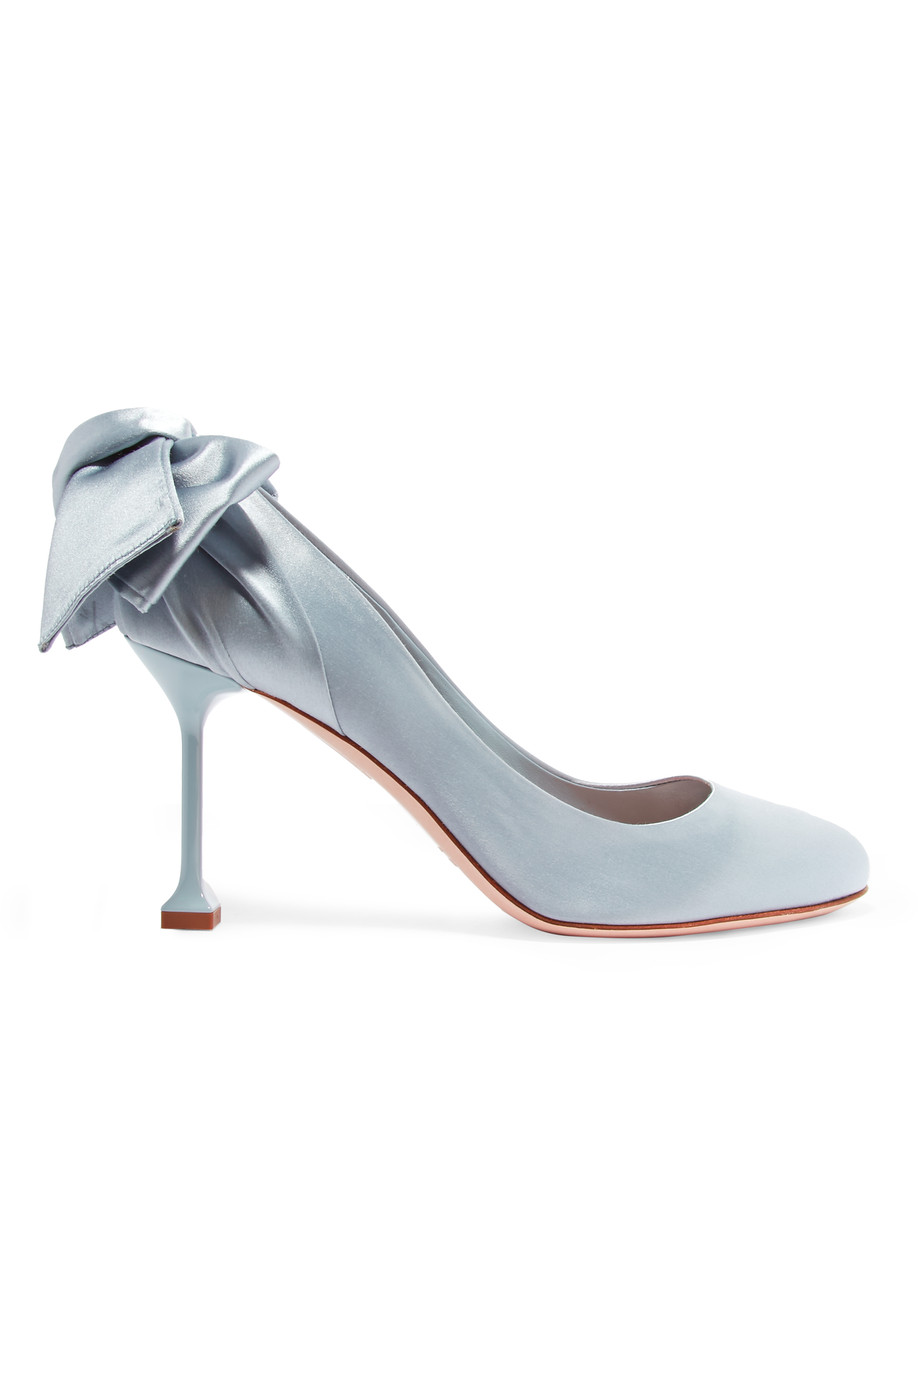 wedding shoes satin